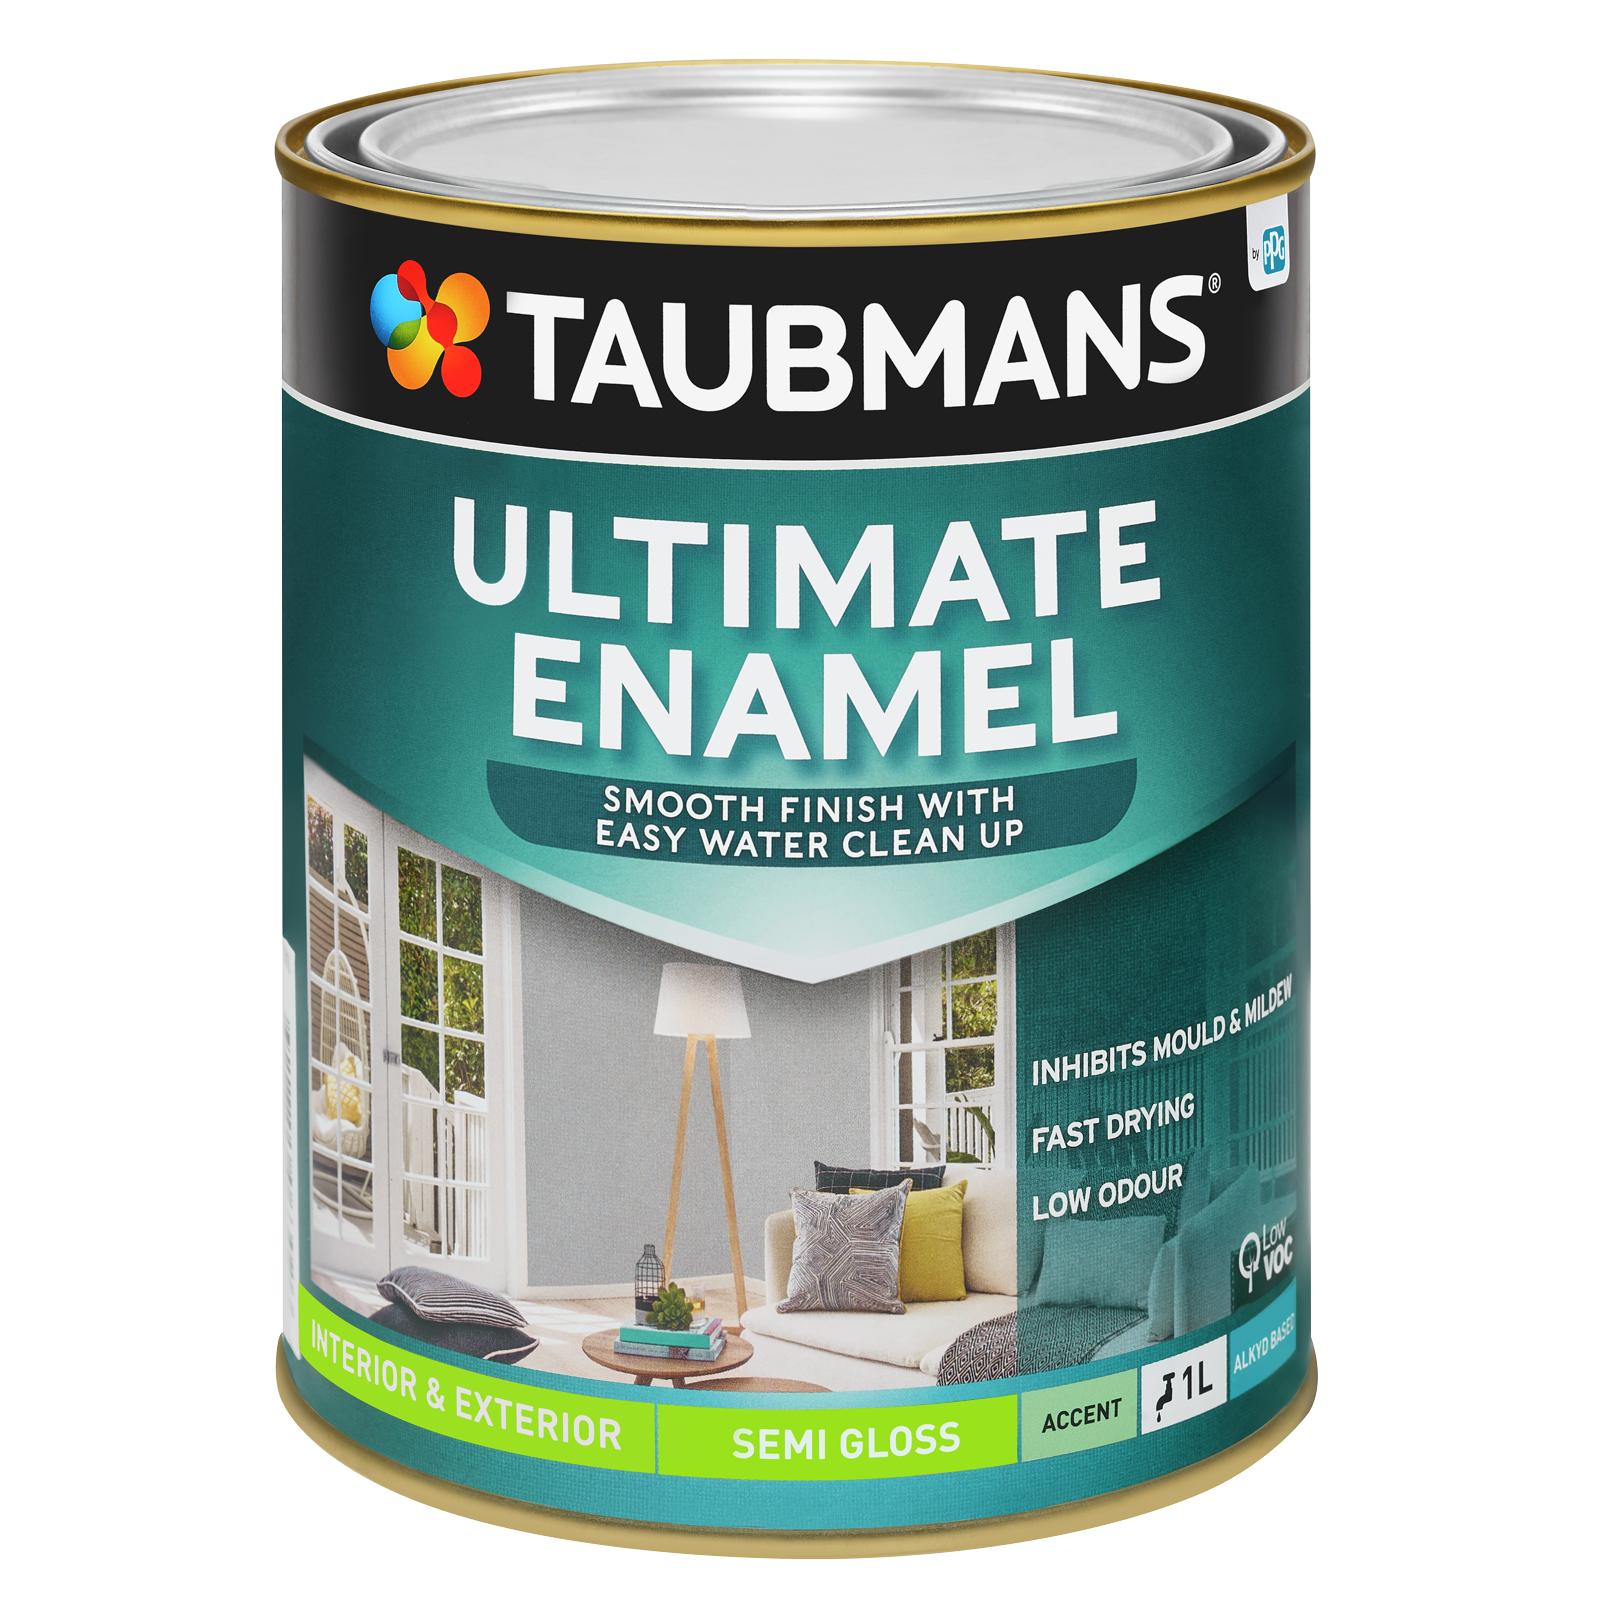 Taubmans Ultimate Enamel Accent Semi Gloss Enamel - 1L